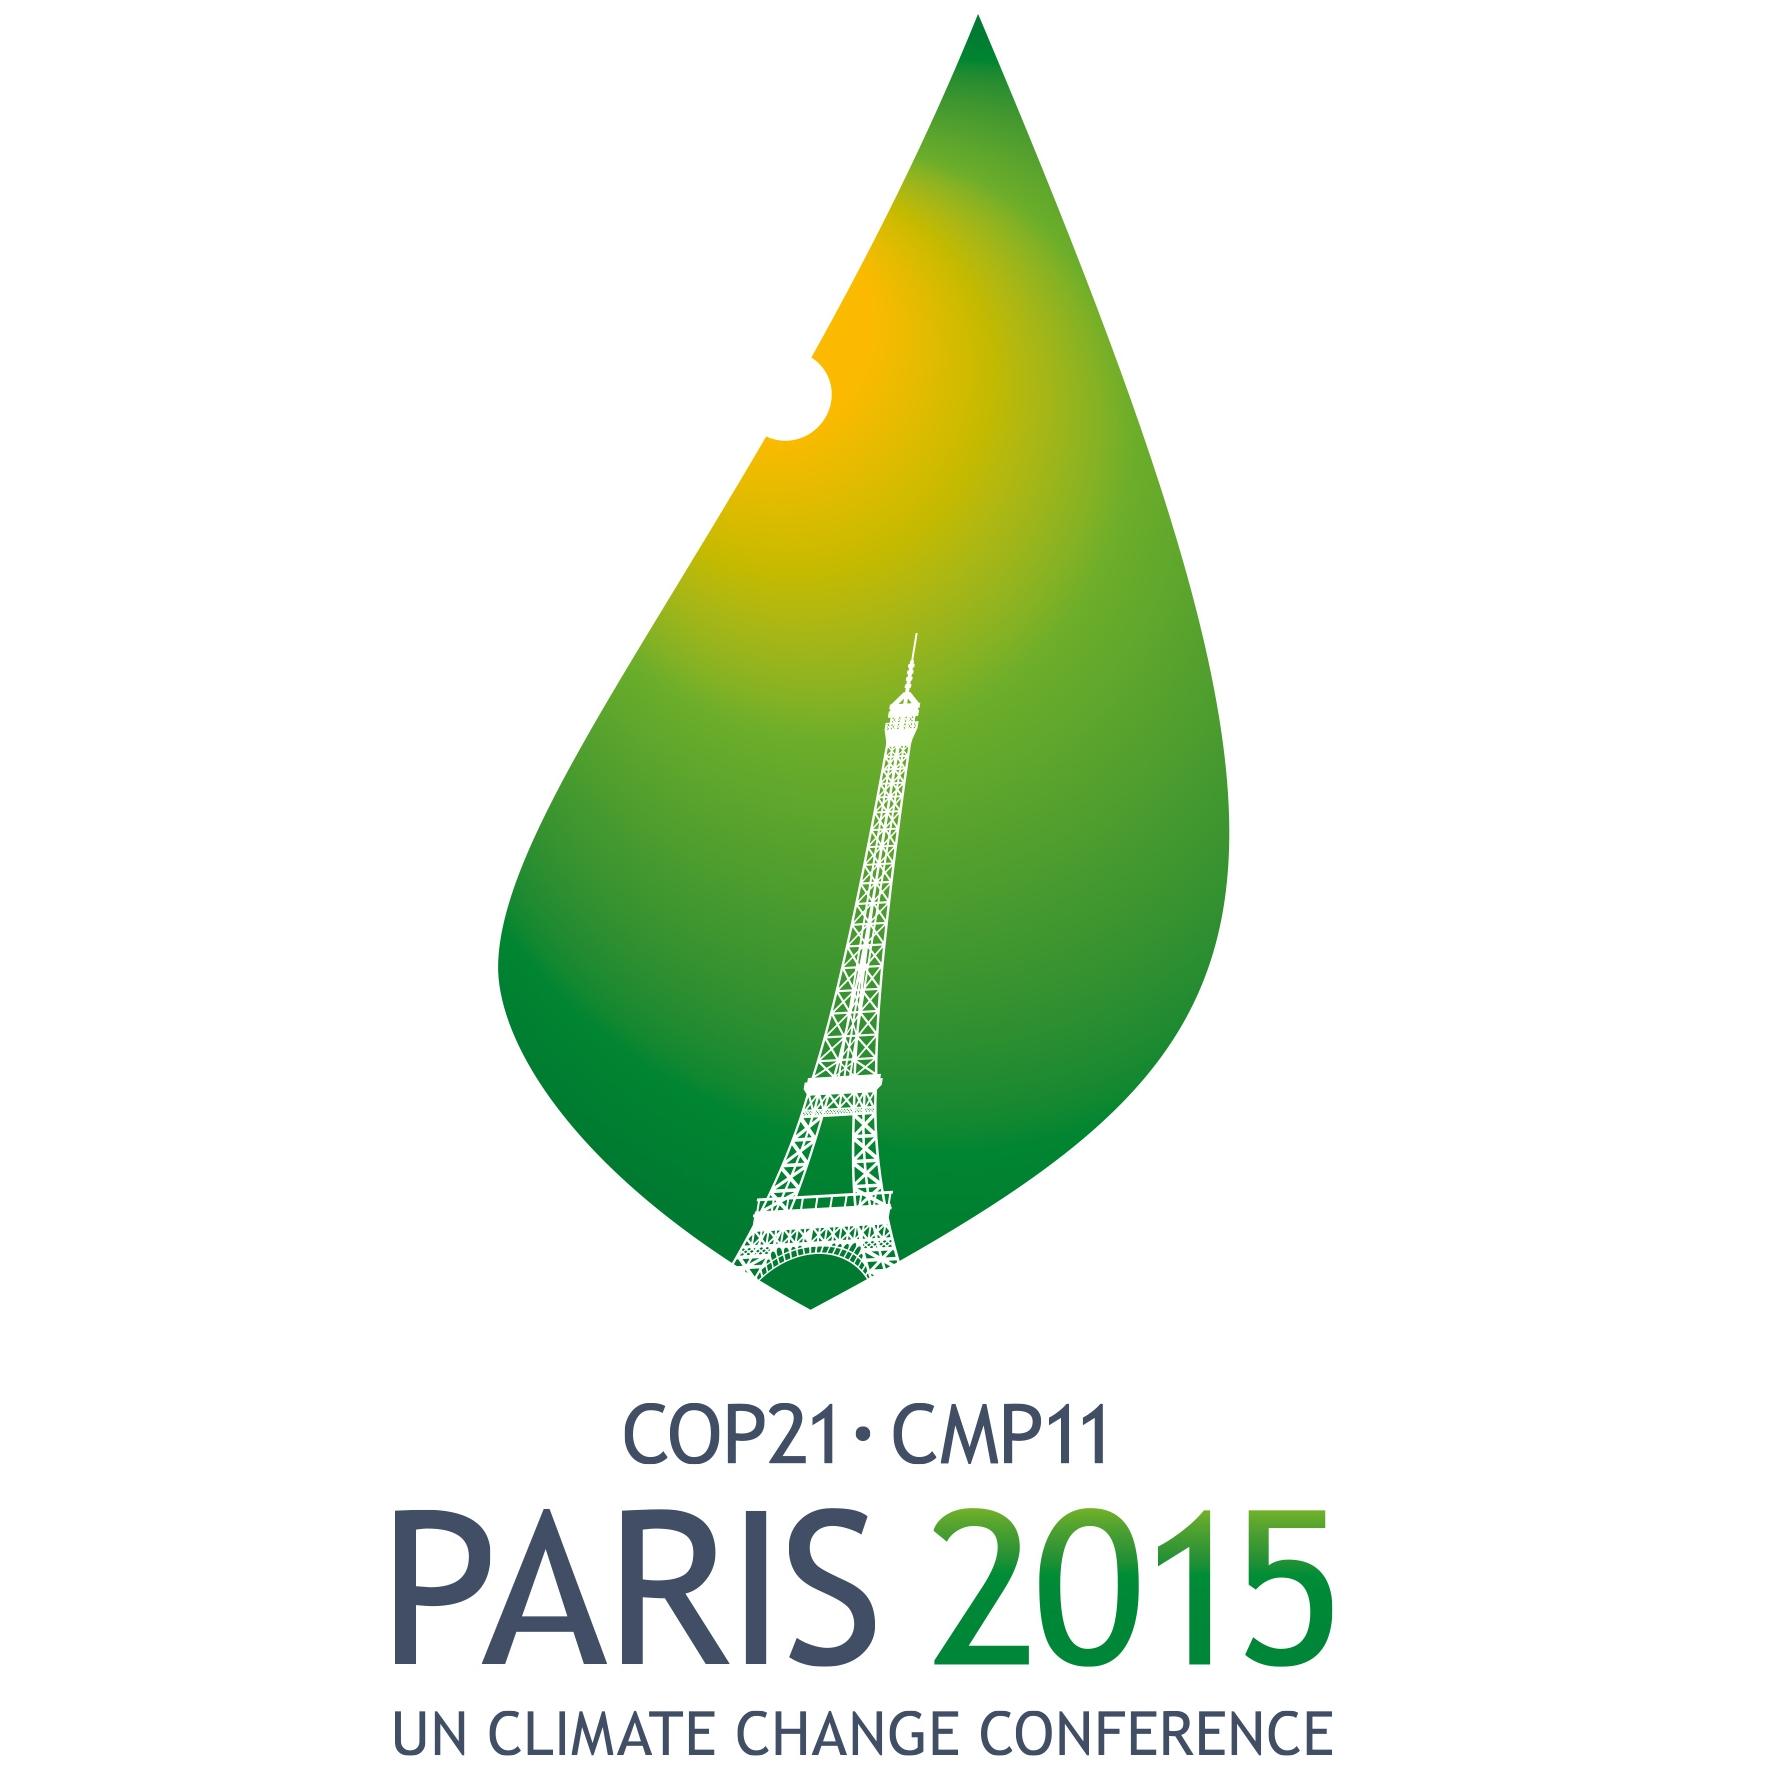 http://www.reddetransicion.org/wp-content/uploads/2015/10/COP21.jpg